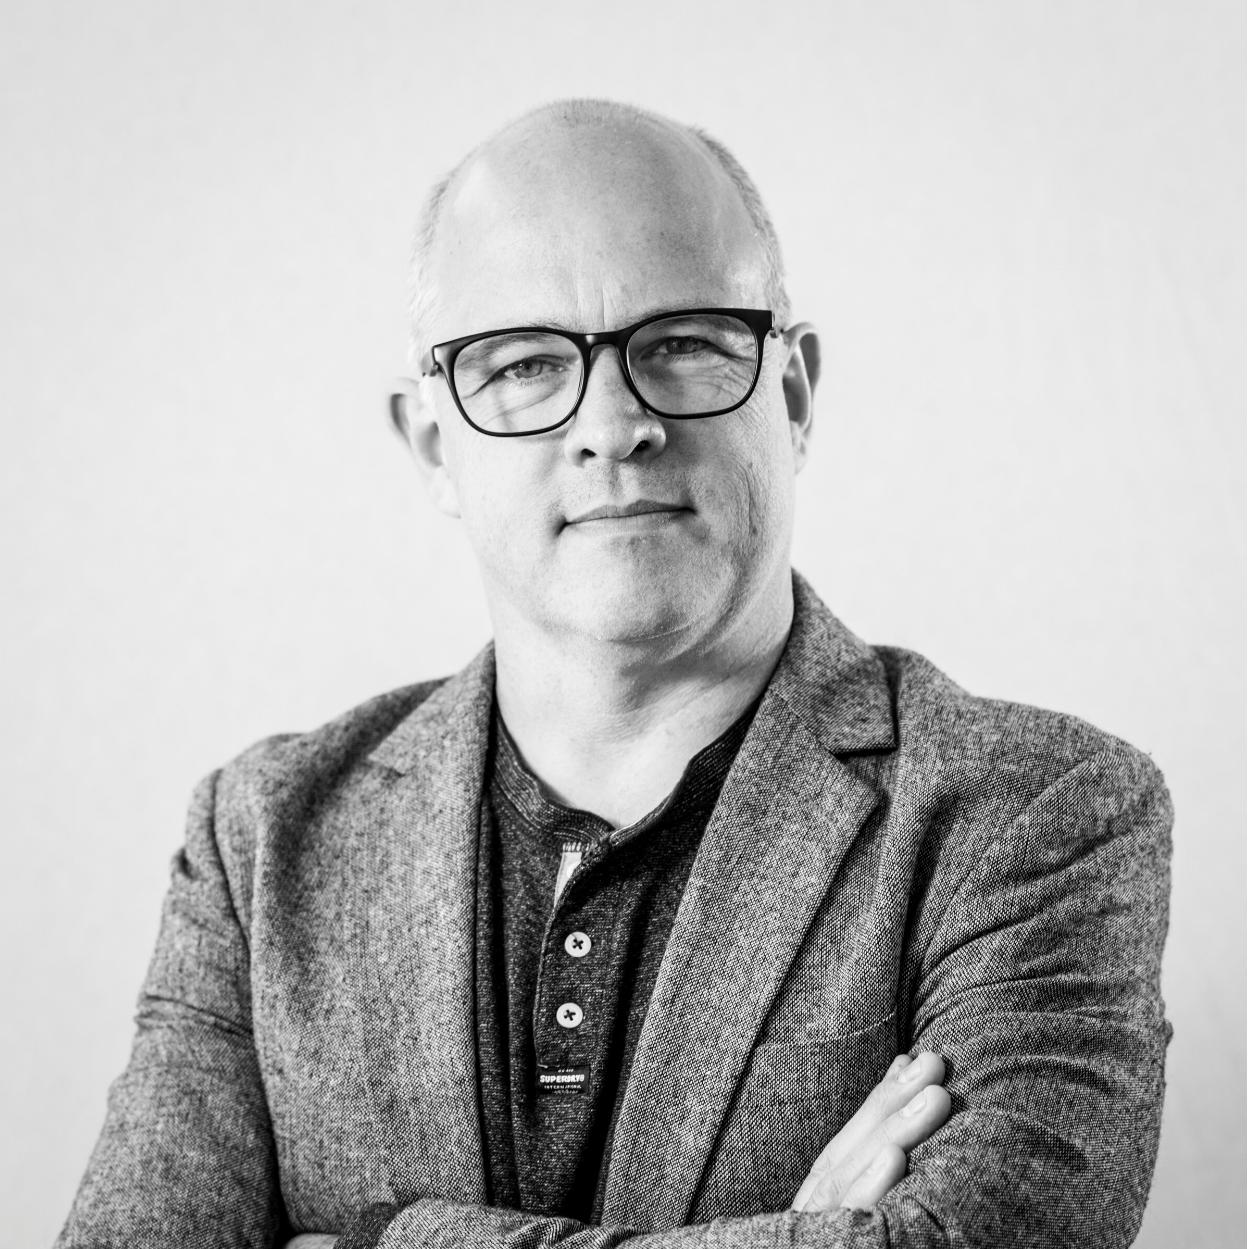 Stephen Waddington HardNumbers COVID-19 PR Agency Startup report